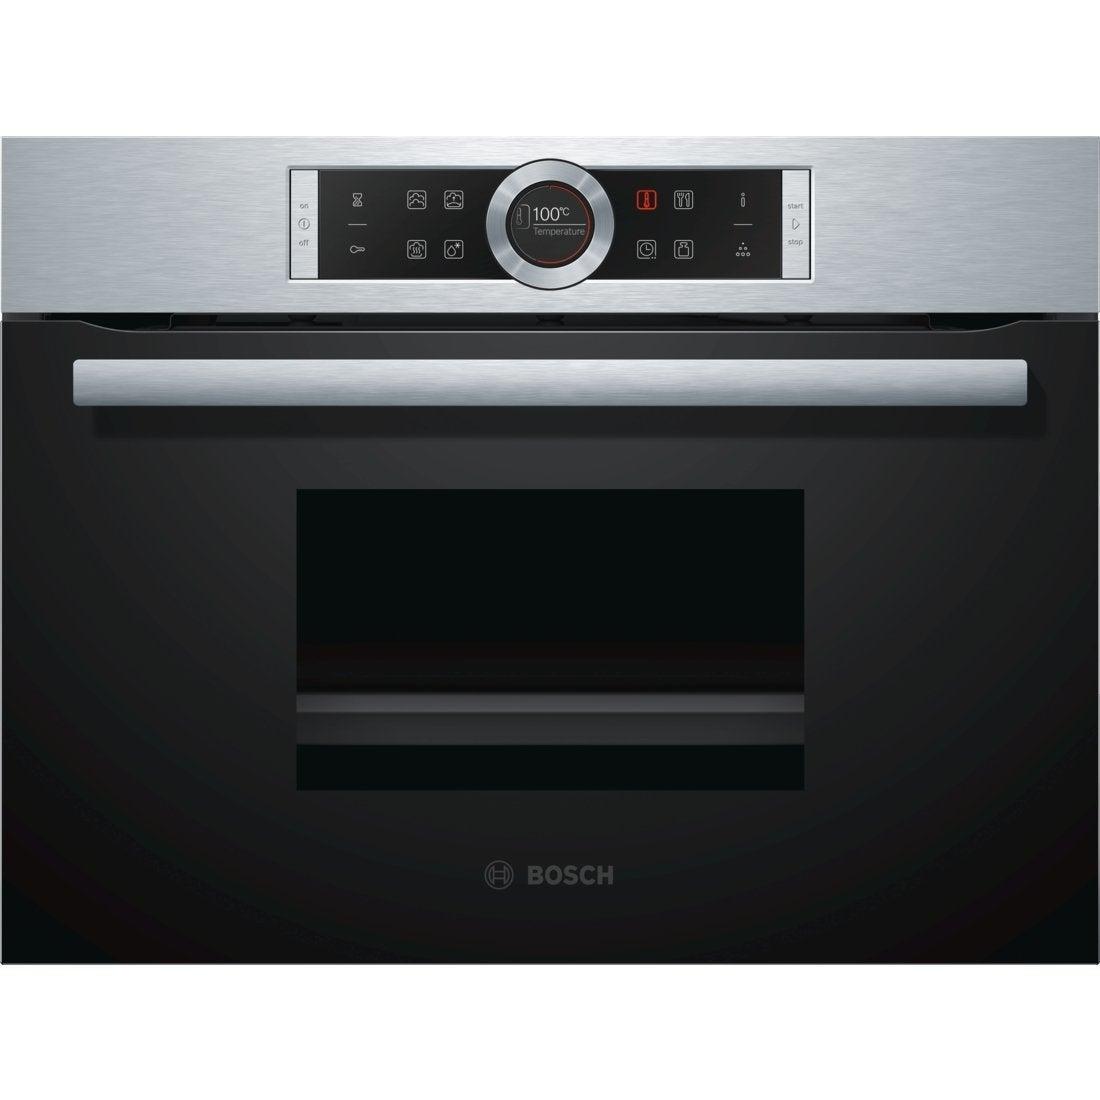 Bosch CDG634BS1 Oven